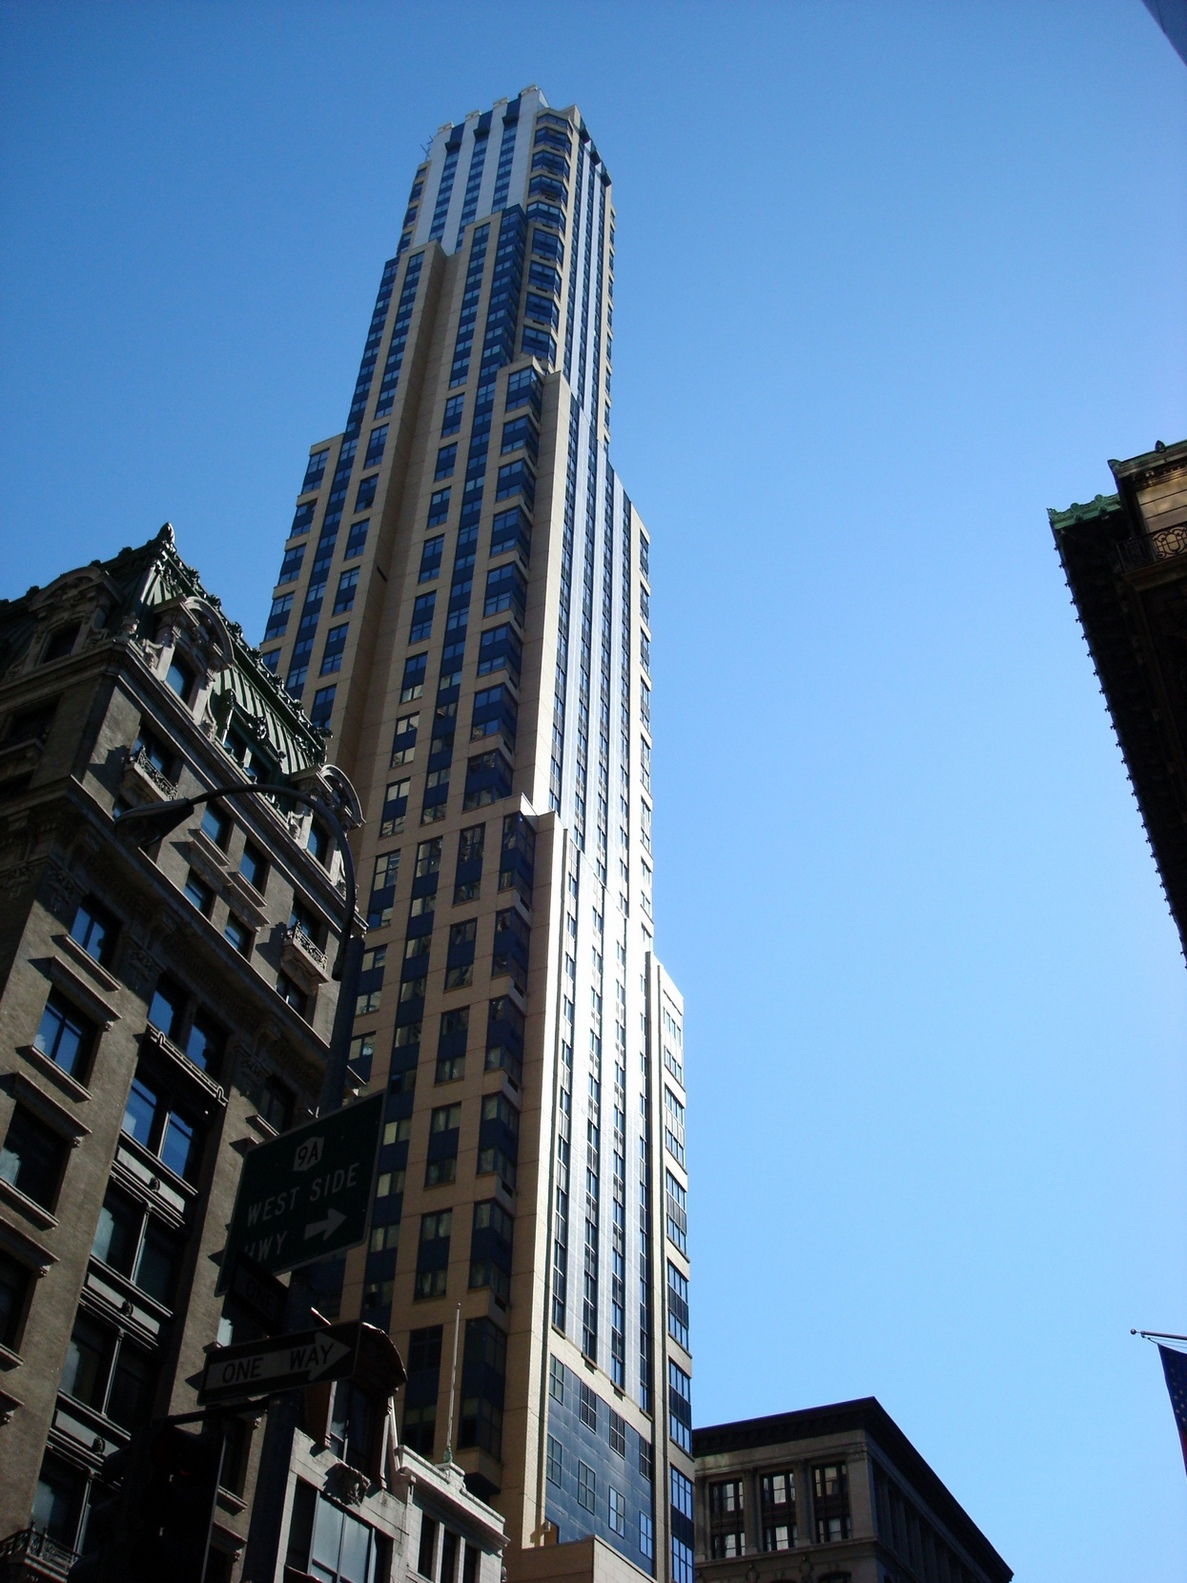 New York City_MiddleManhattan_ResemblingEmpireStateBuilding_Slightly